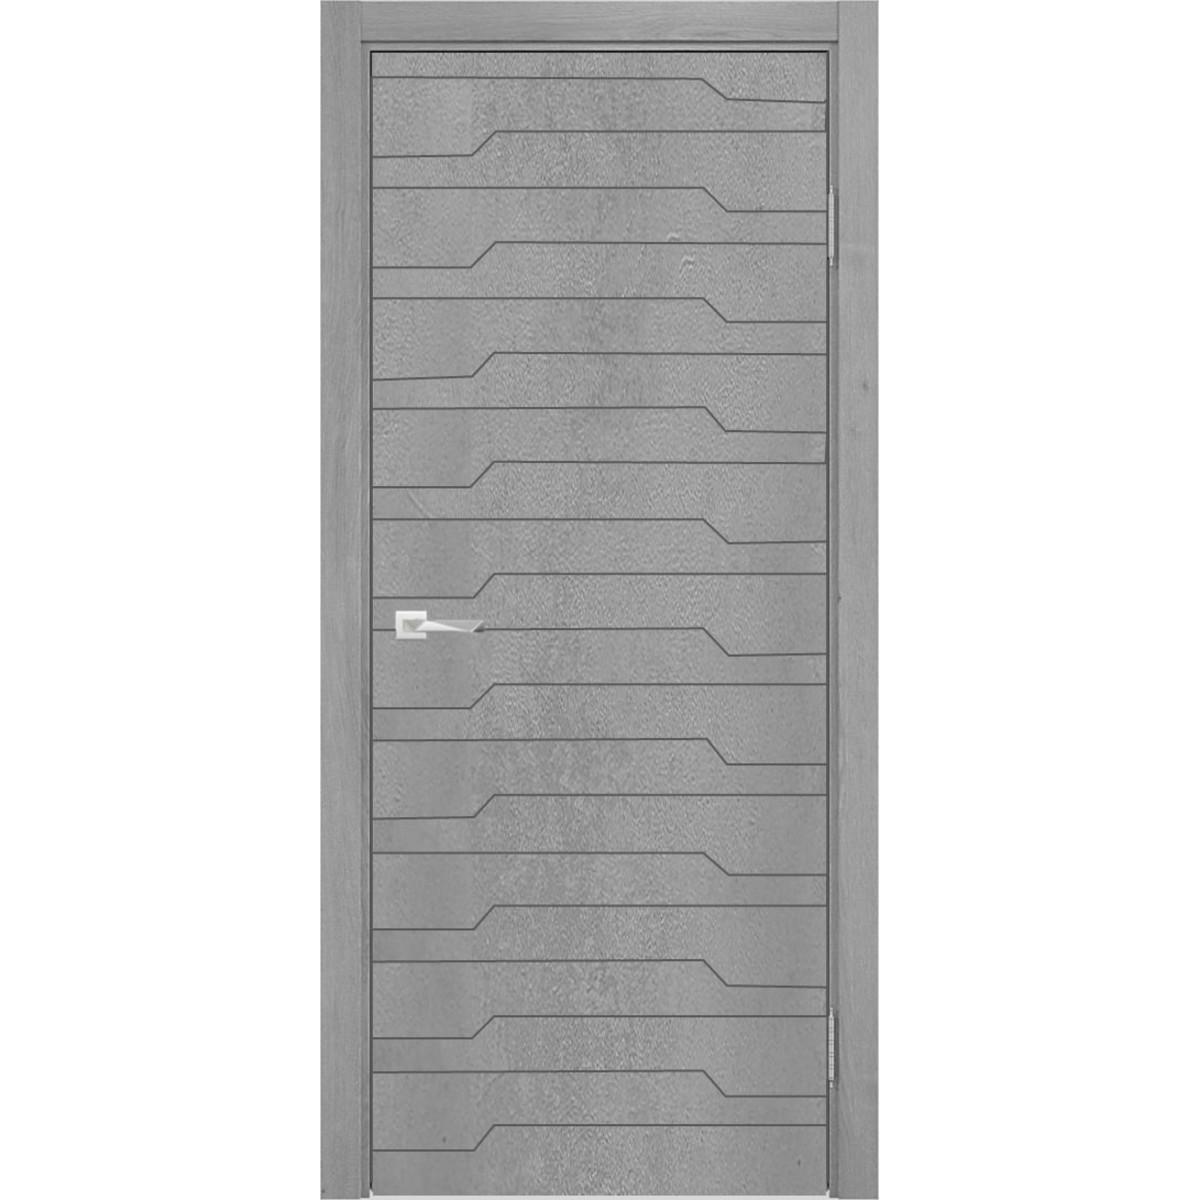 Дверное полотно Loyard Севилья МП_0385 2000х700х44 мм МДФ